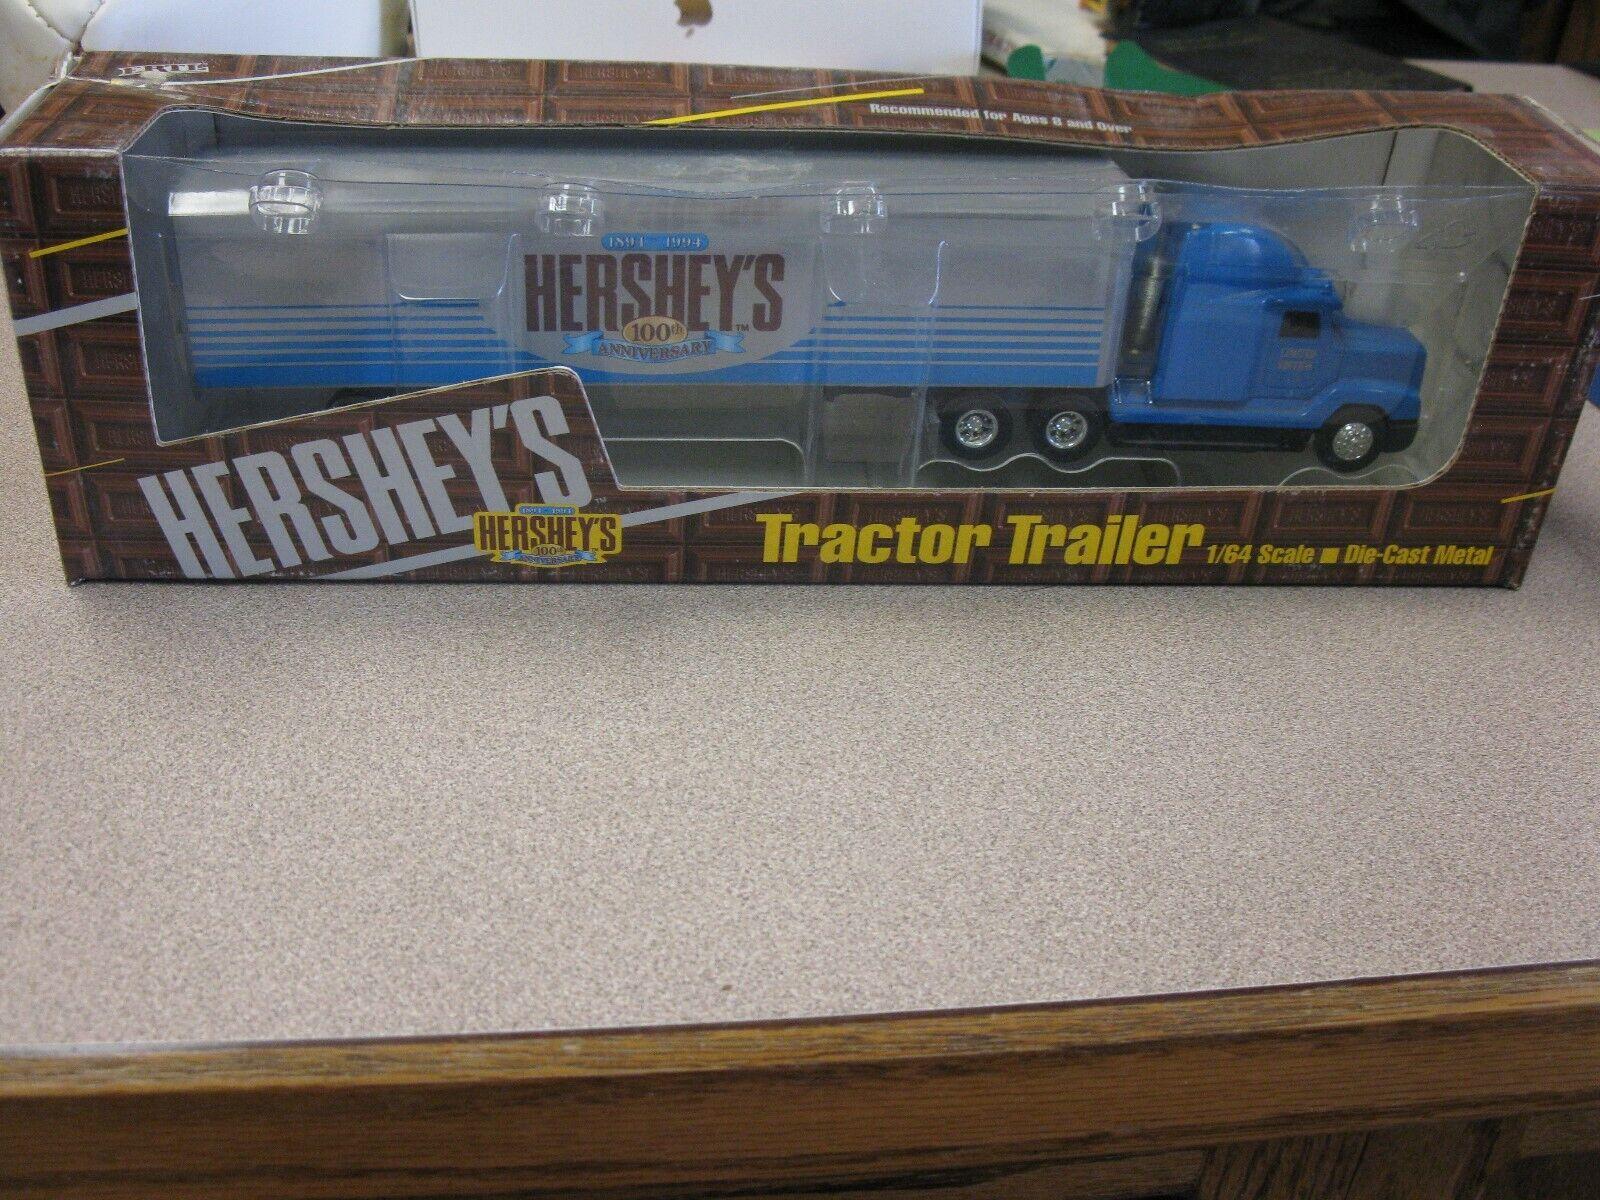 ERTL; 1 64 scale; Hershey's Chocolate Van; semi truck model